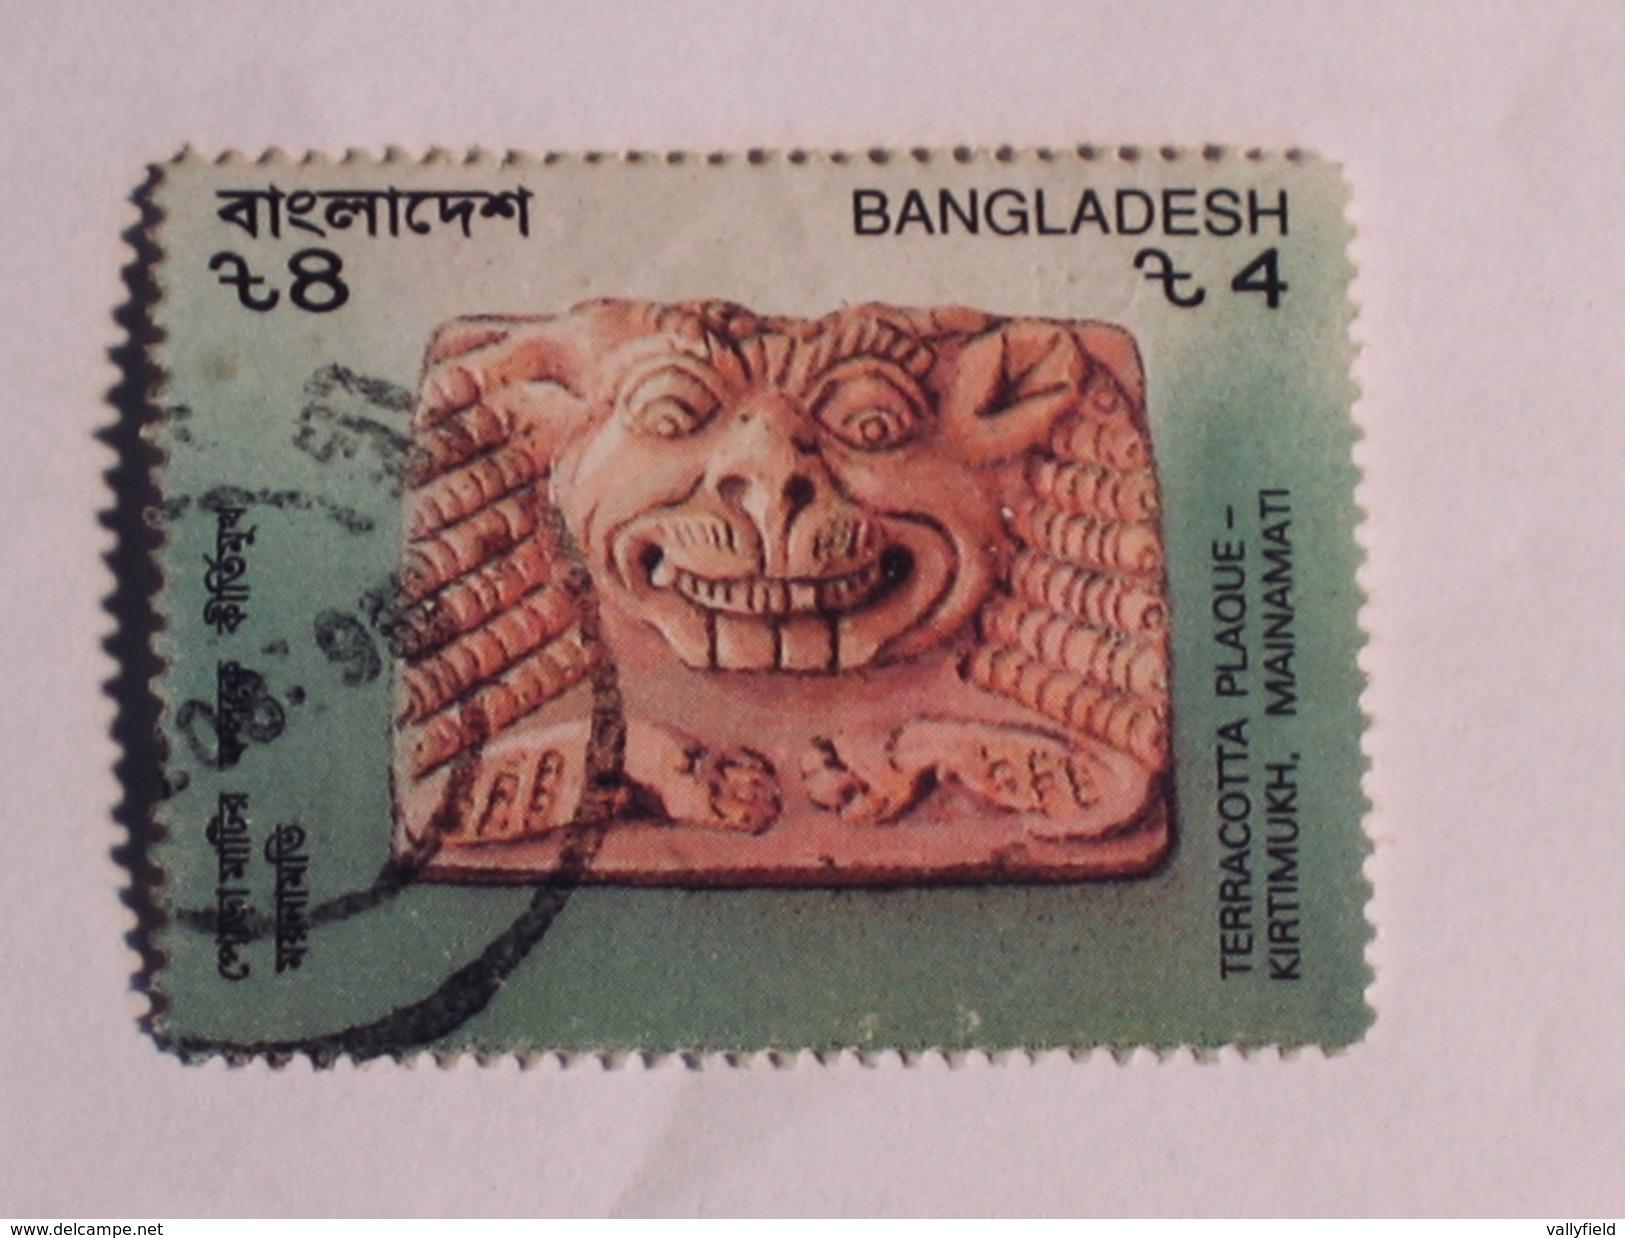 BANGLADESH  1991  Lot # 26 - Bangladesh